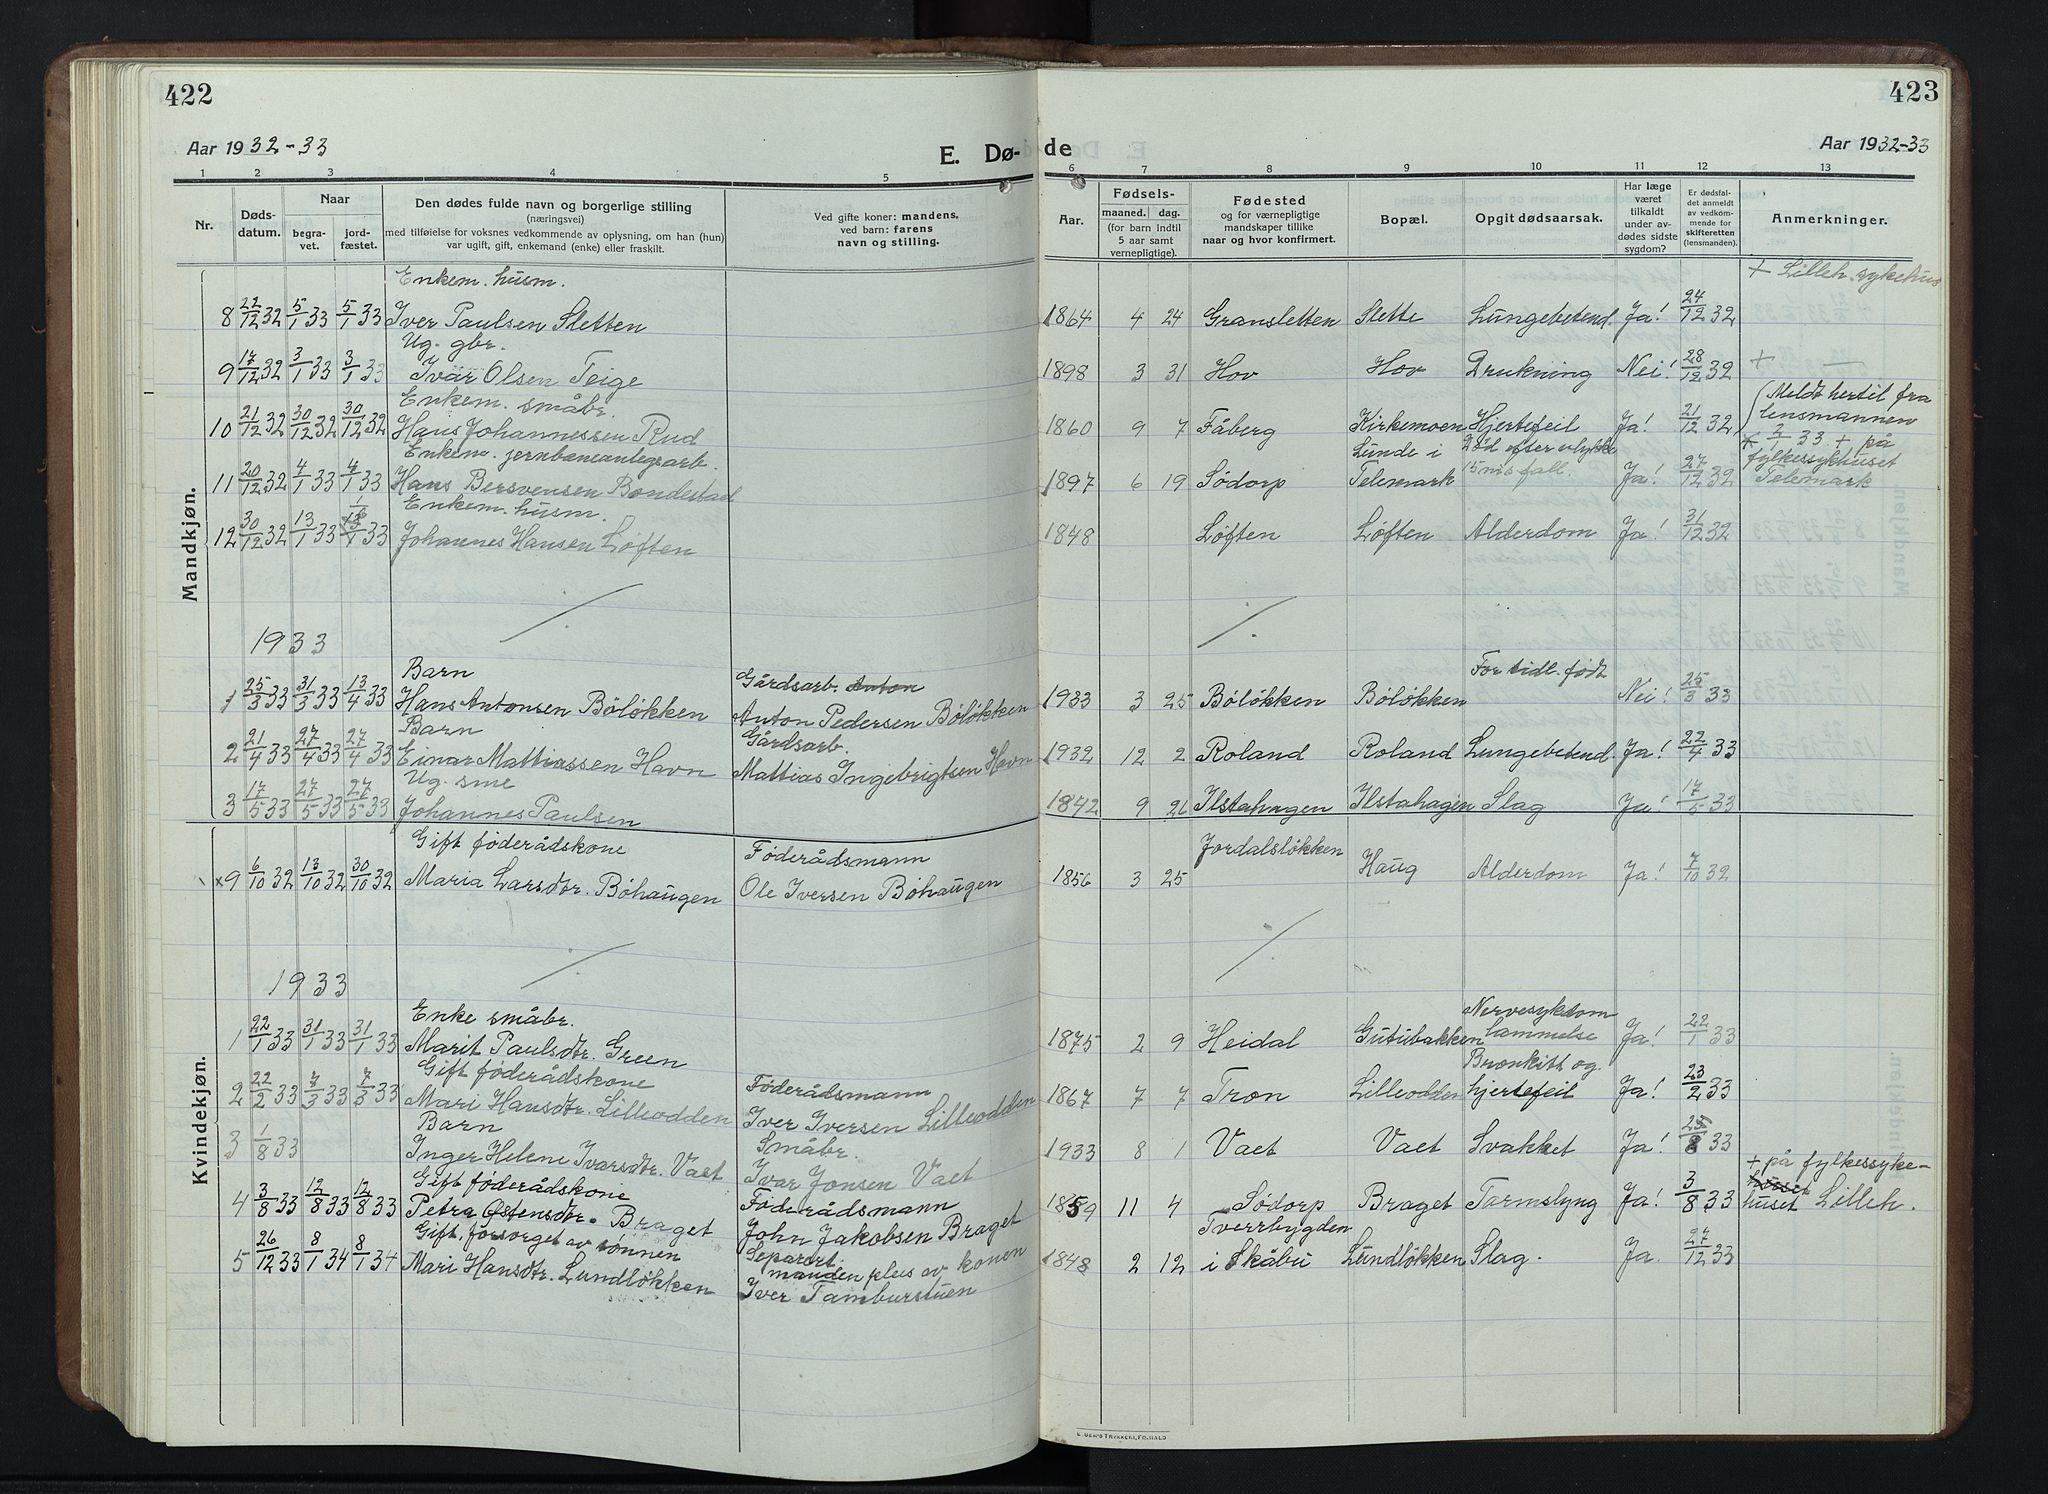 SAH, Nord-Fron prestekontor, Klokkerbok nr. 7, 1915-1946, s. 422-423